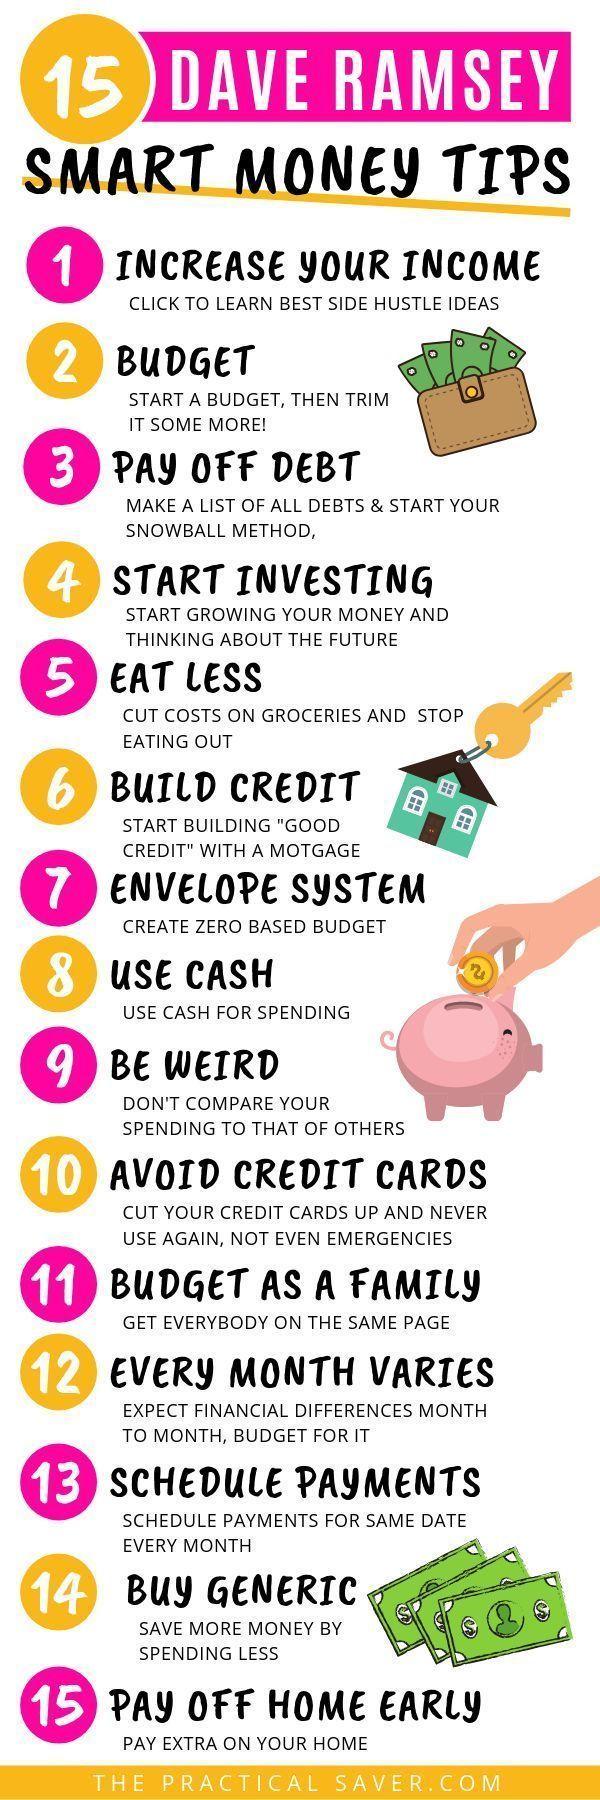 Dave Ramsey Tips: 15 Best Smart Money Tips From Da…